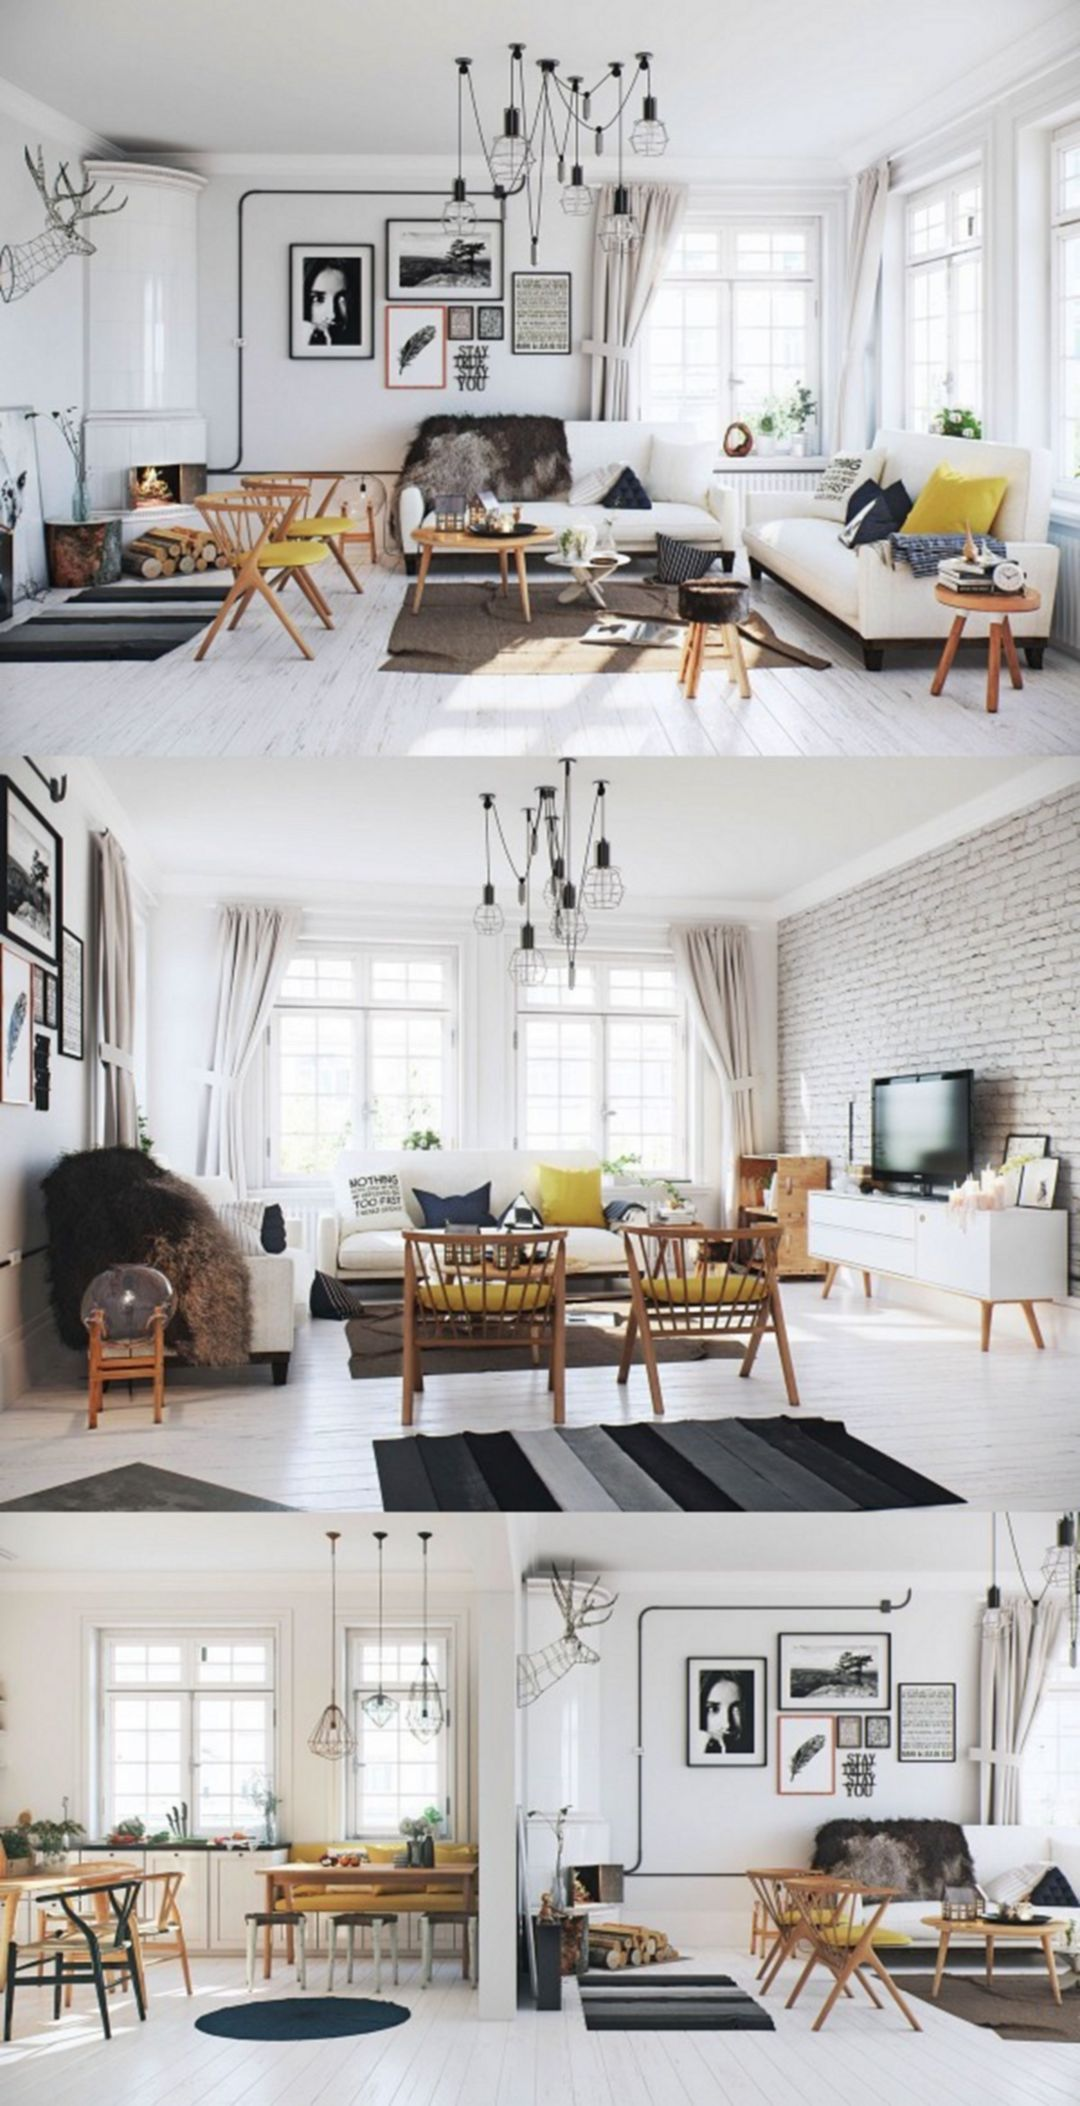 Amazing Scandinavian Living Room Ideas For Sweet Home Design 57014 ...